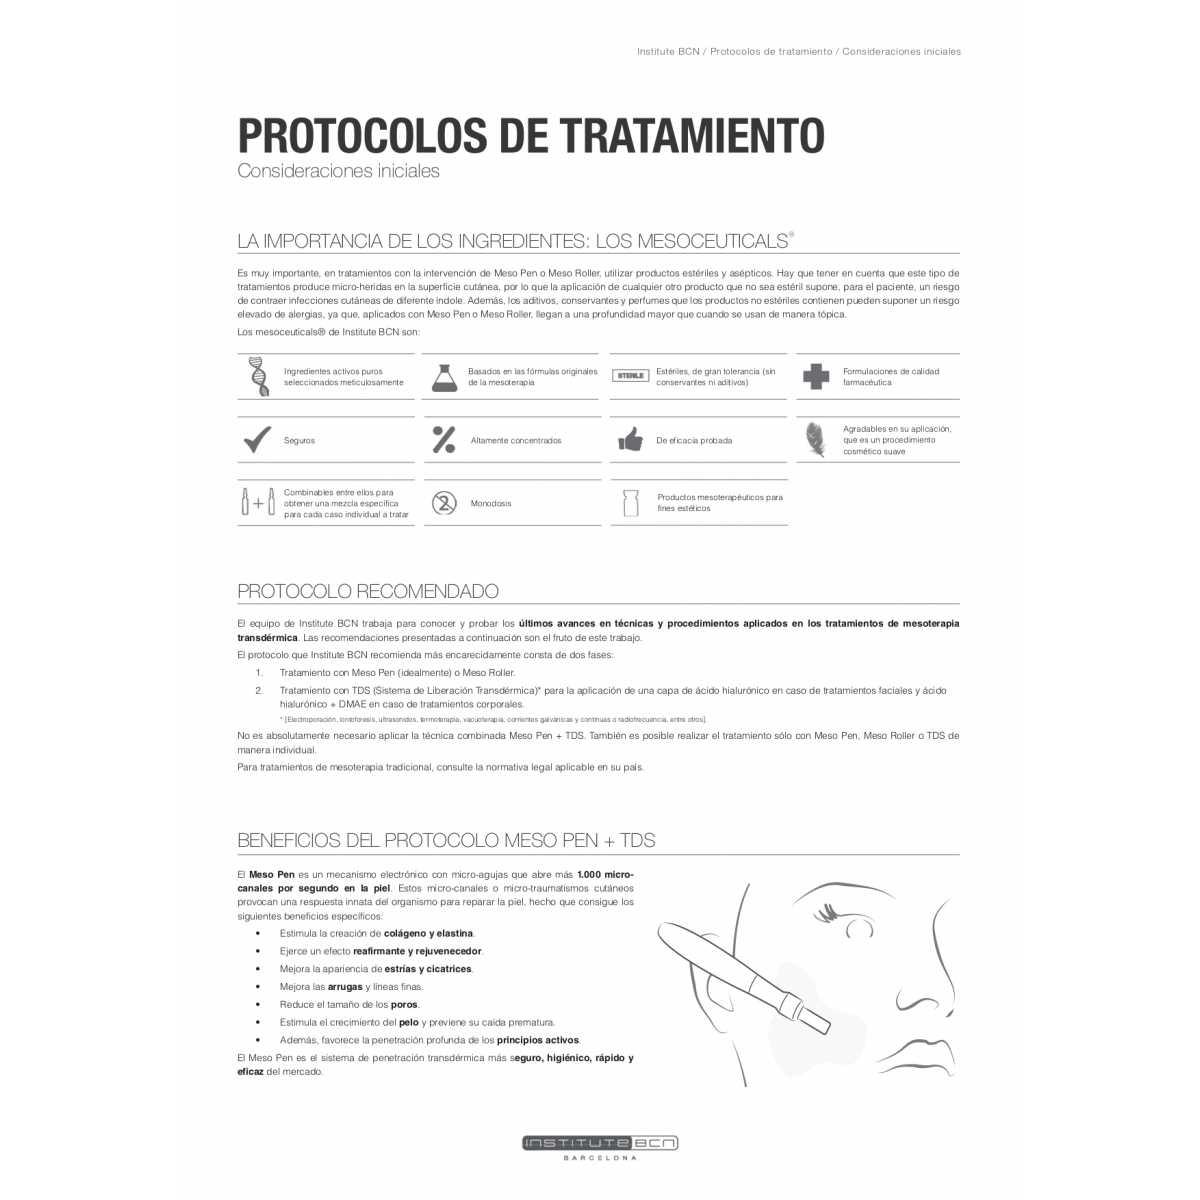 Polyvitamins - Blister - Soluzione Nutritiva - Principi attivi - Institute BCN